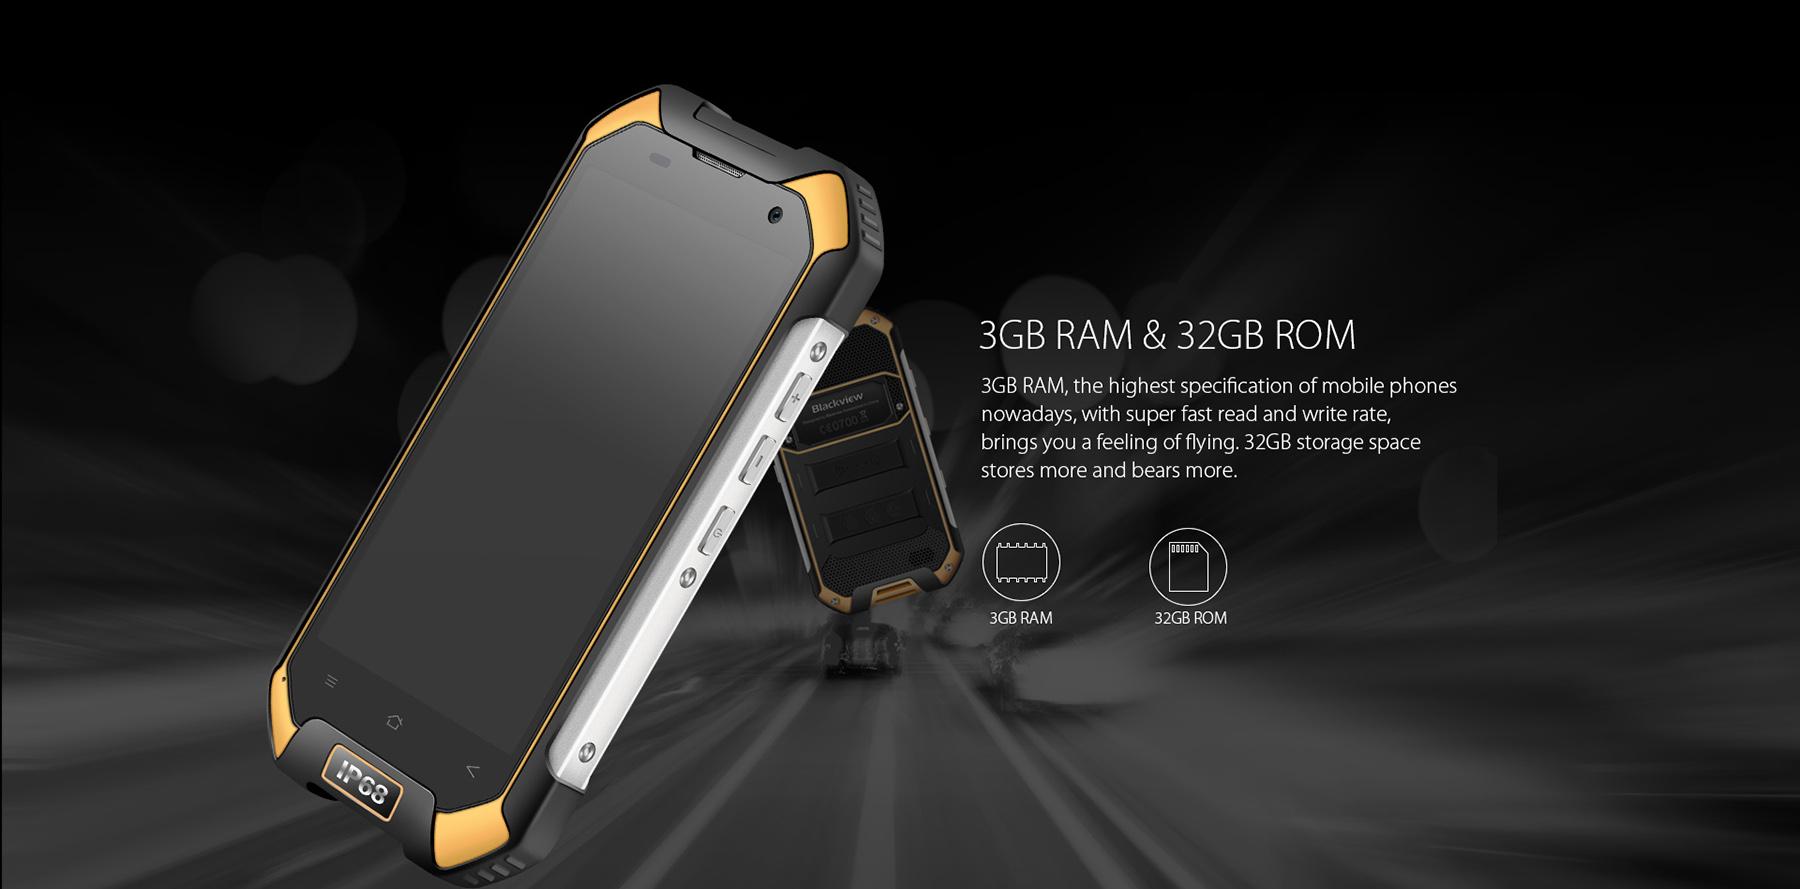 Blackview BV6000, Helio P10 MediaTek, 3GB ROM, Android 6.0, wasserdicht Outdoor Smartphone, Testbericht